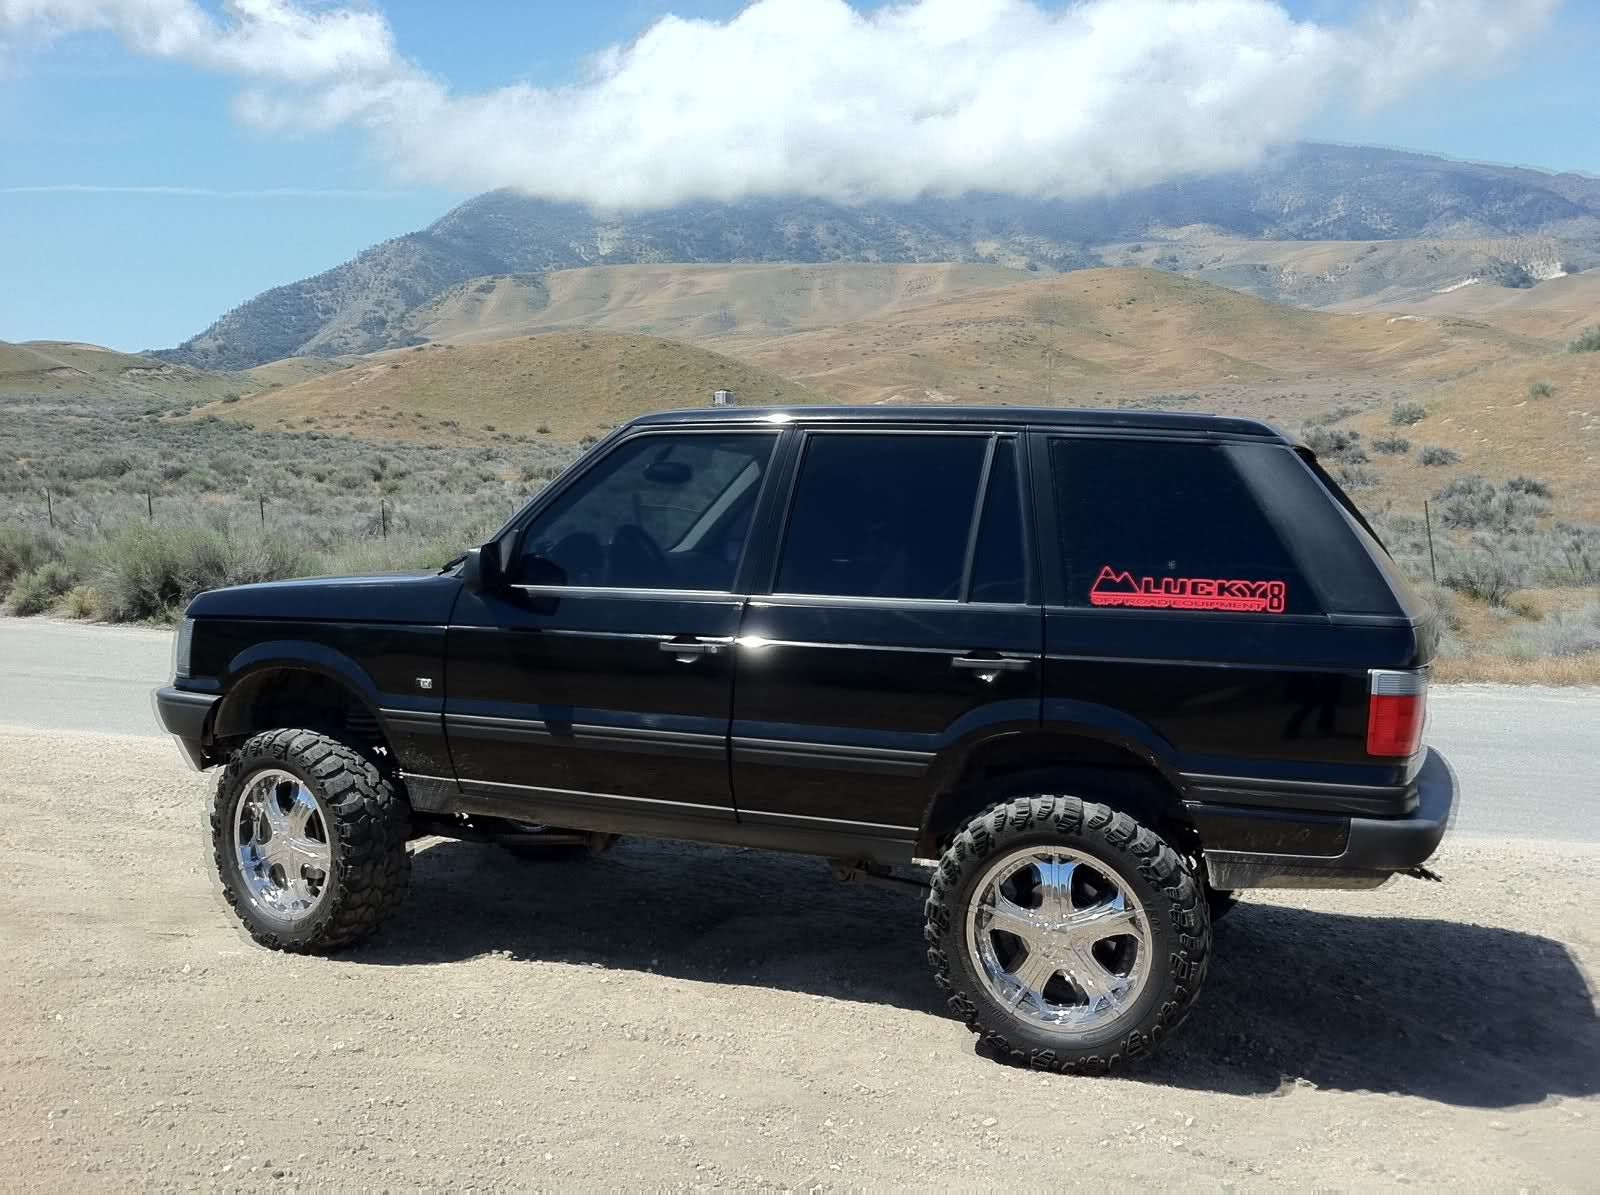 p38 lift kit Google Search Land Rover